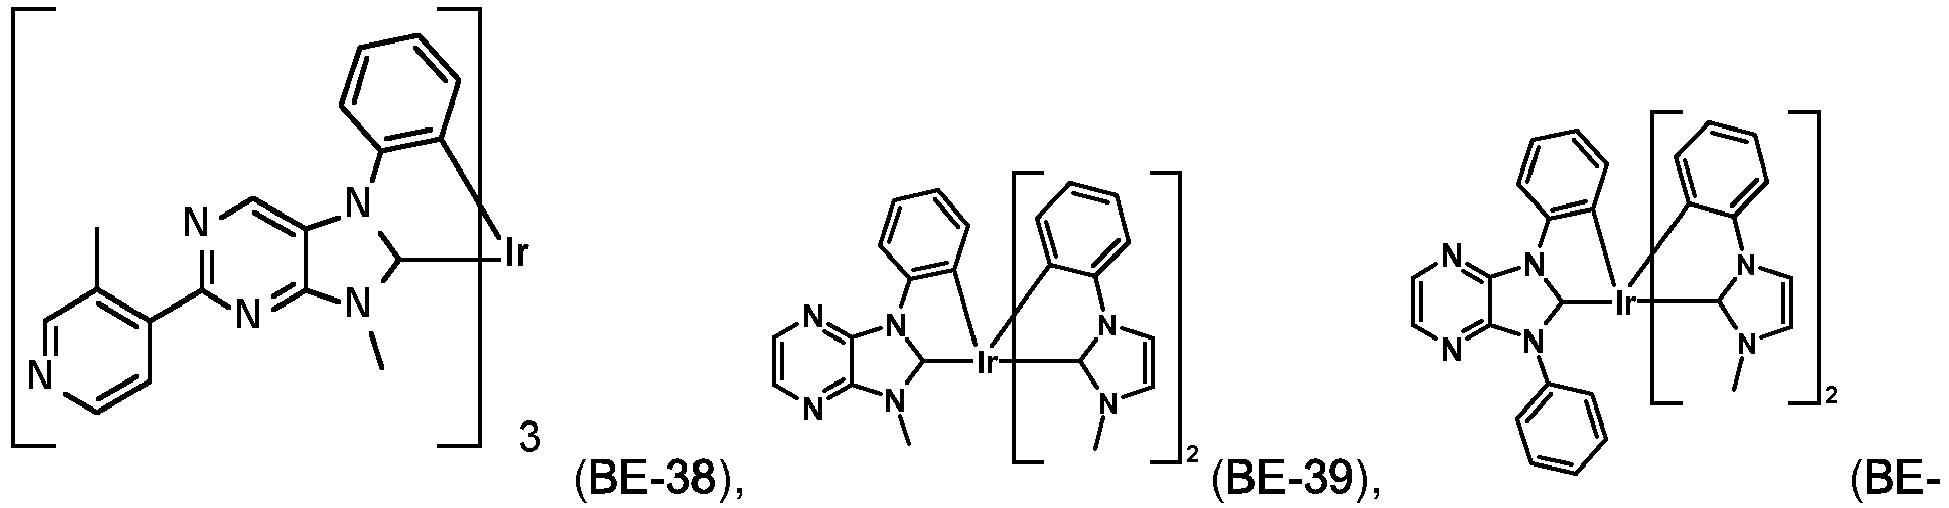 Figure imgb0766